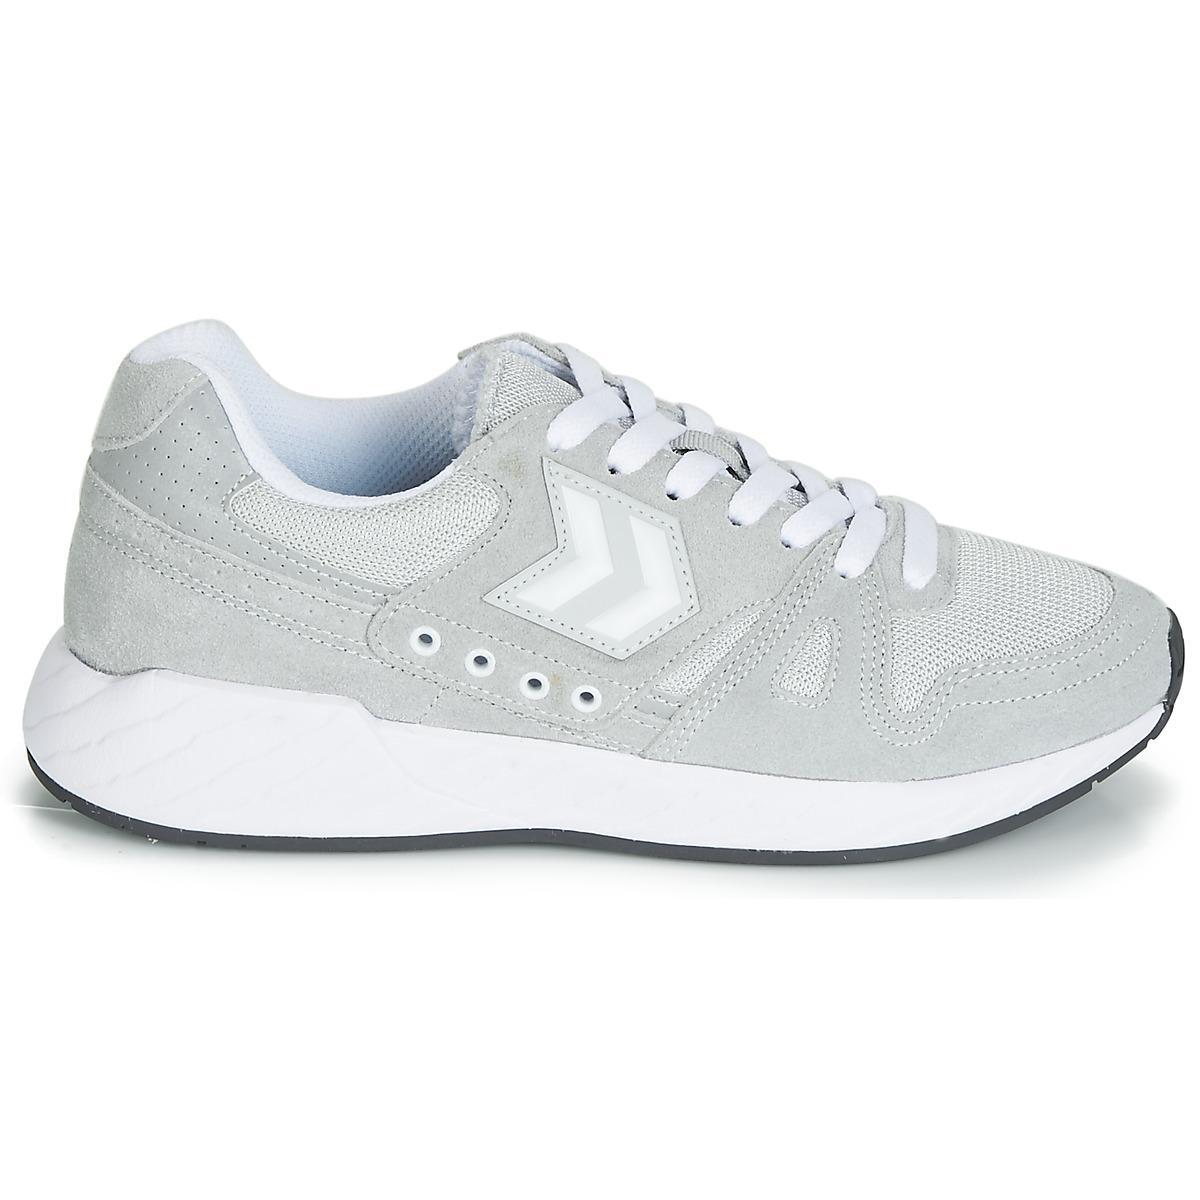 96d704dc116b Hummel - Gray Legend Marathona Men s Shoes (trainers) In Grey for Men -  Lyst. View fullscreen